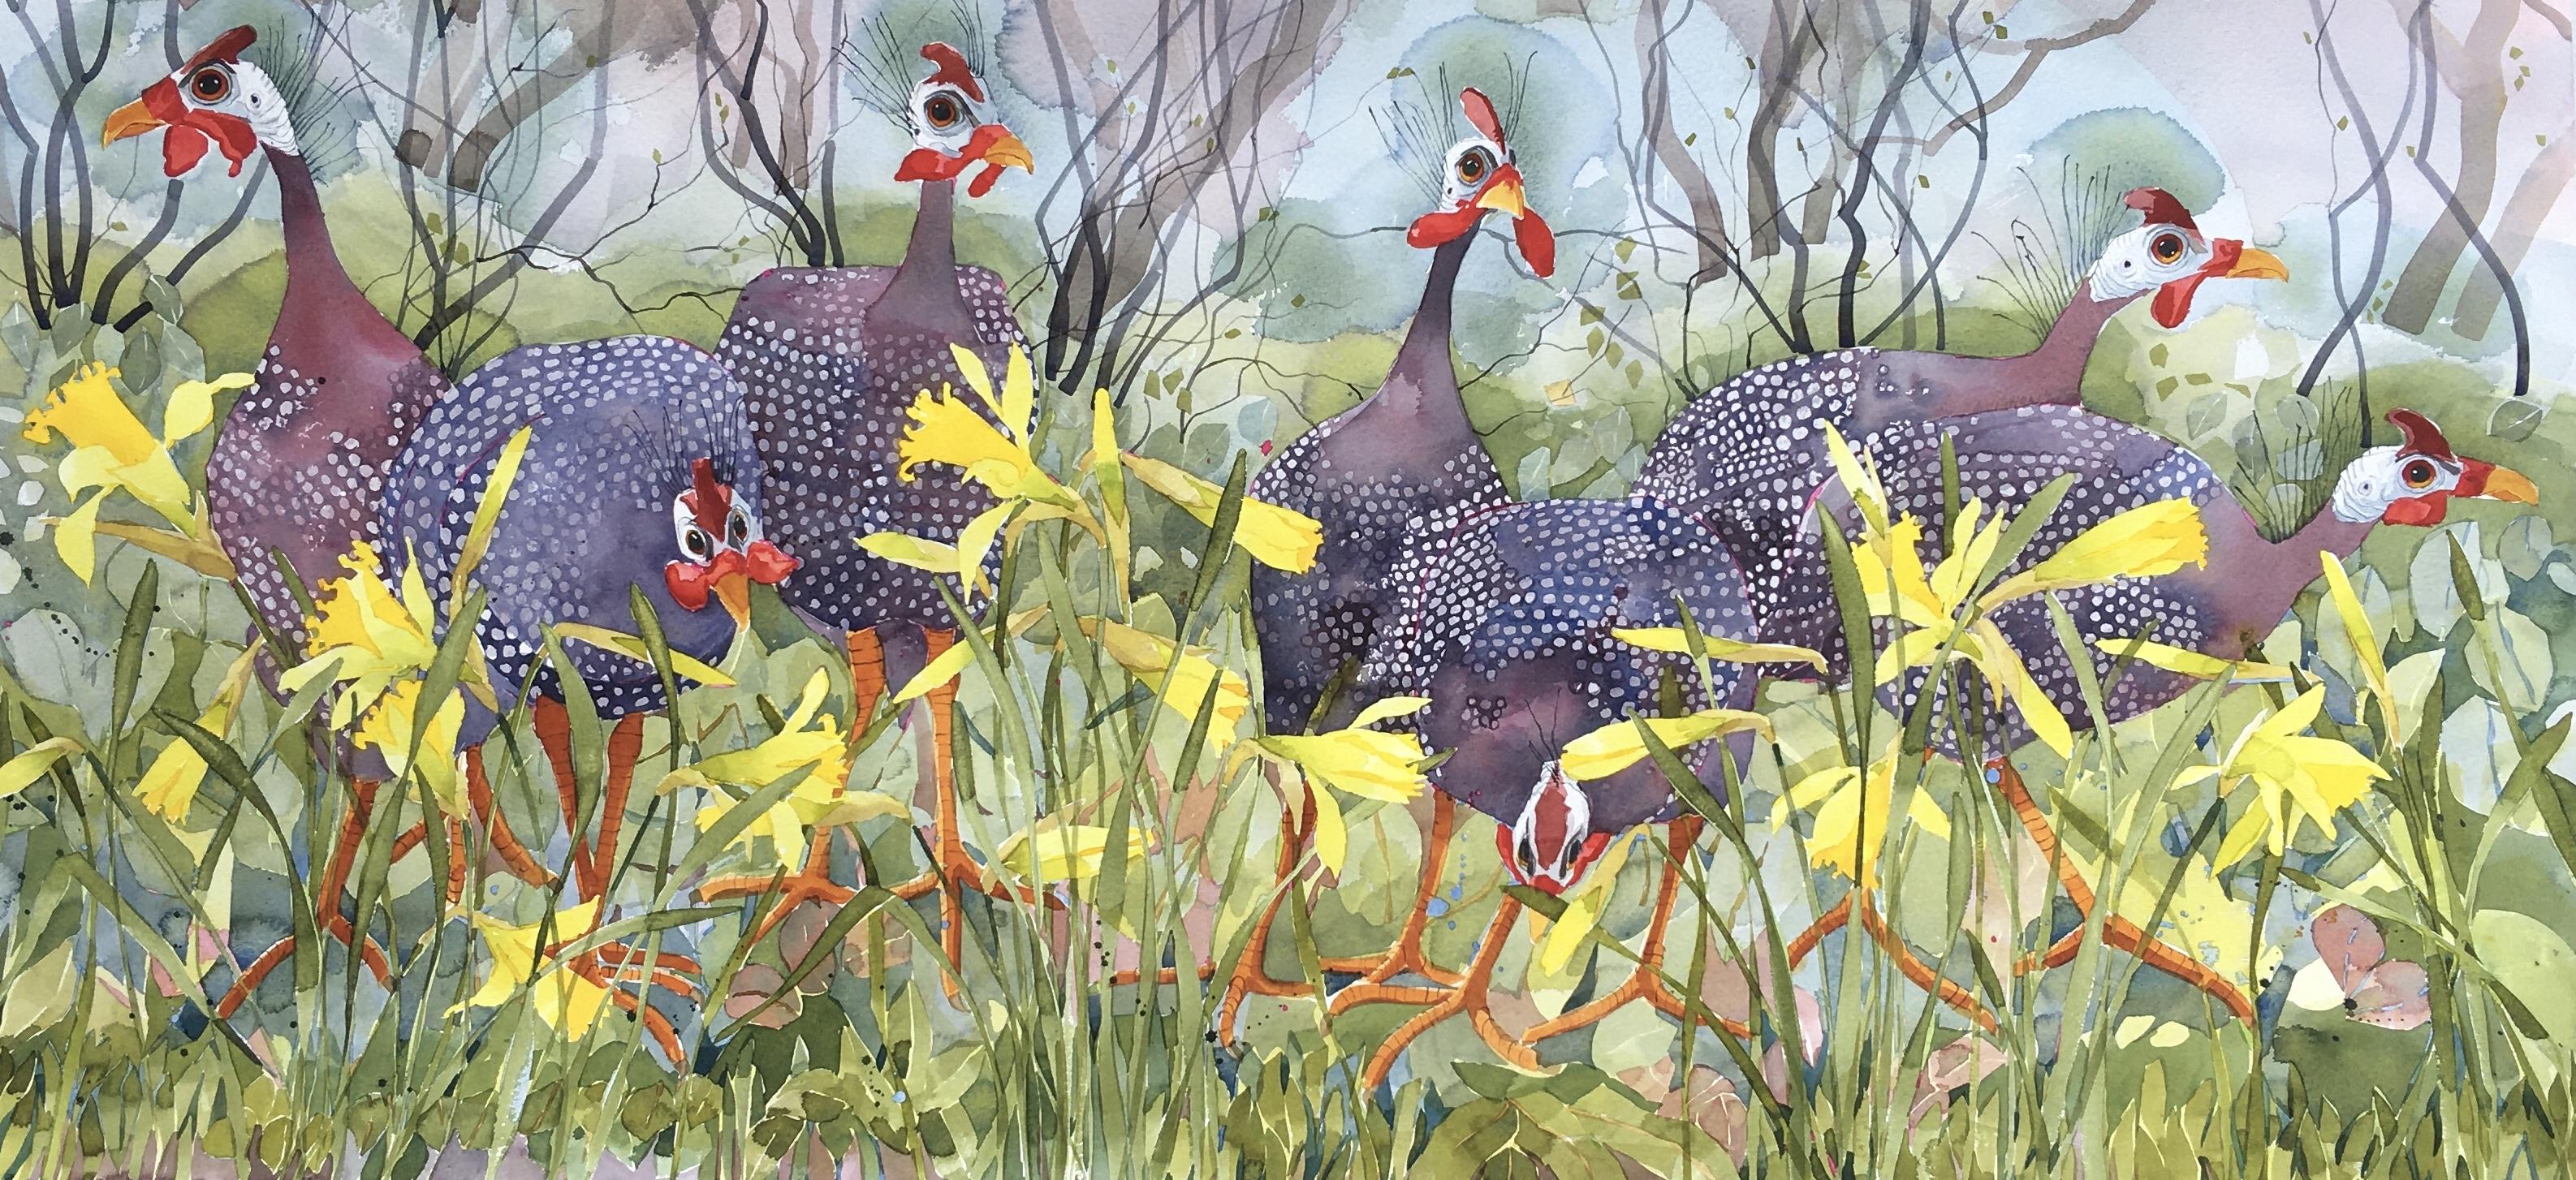 Guinea Fowl in Daffodils image